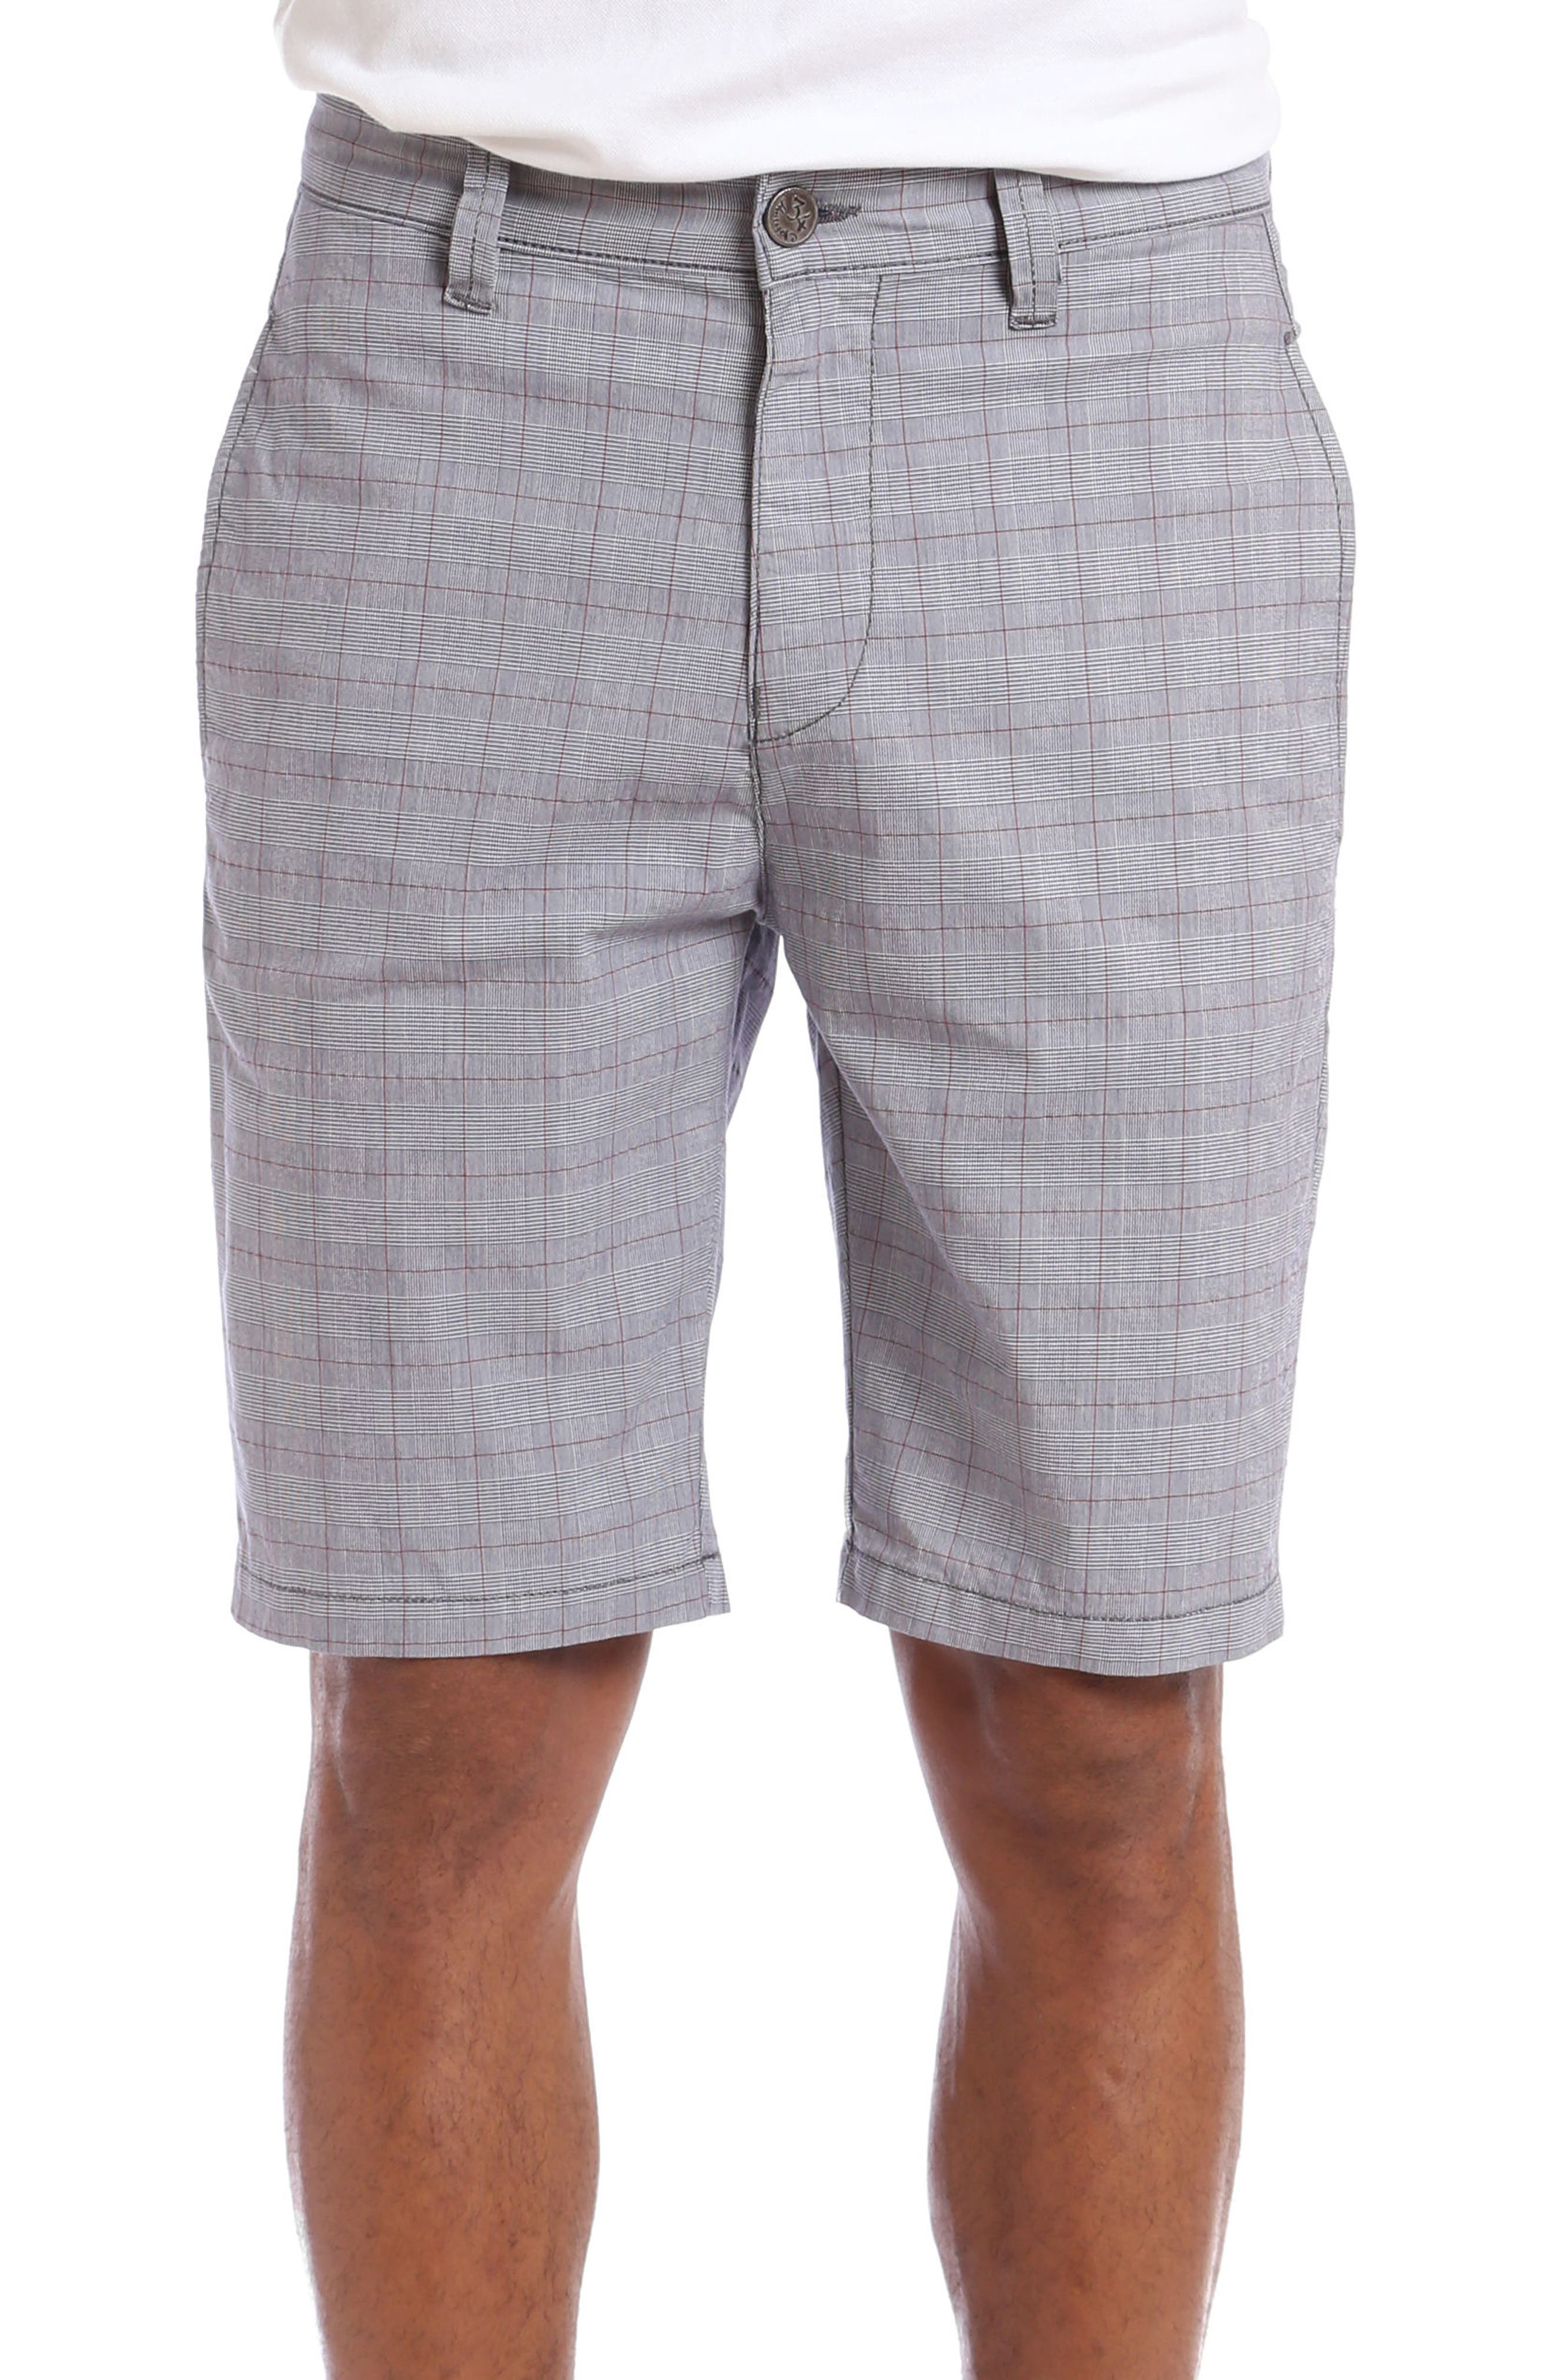 Nevada Twill Shorts,                         Main,                         color, GREY PLAID